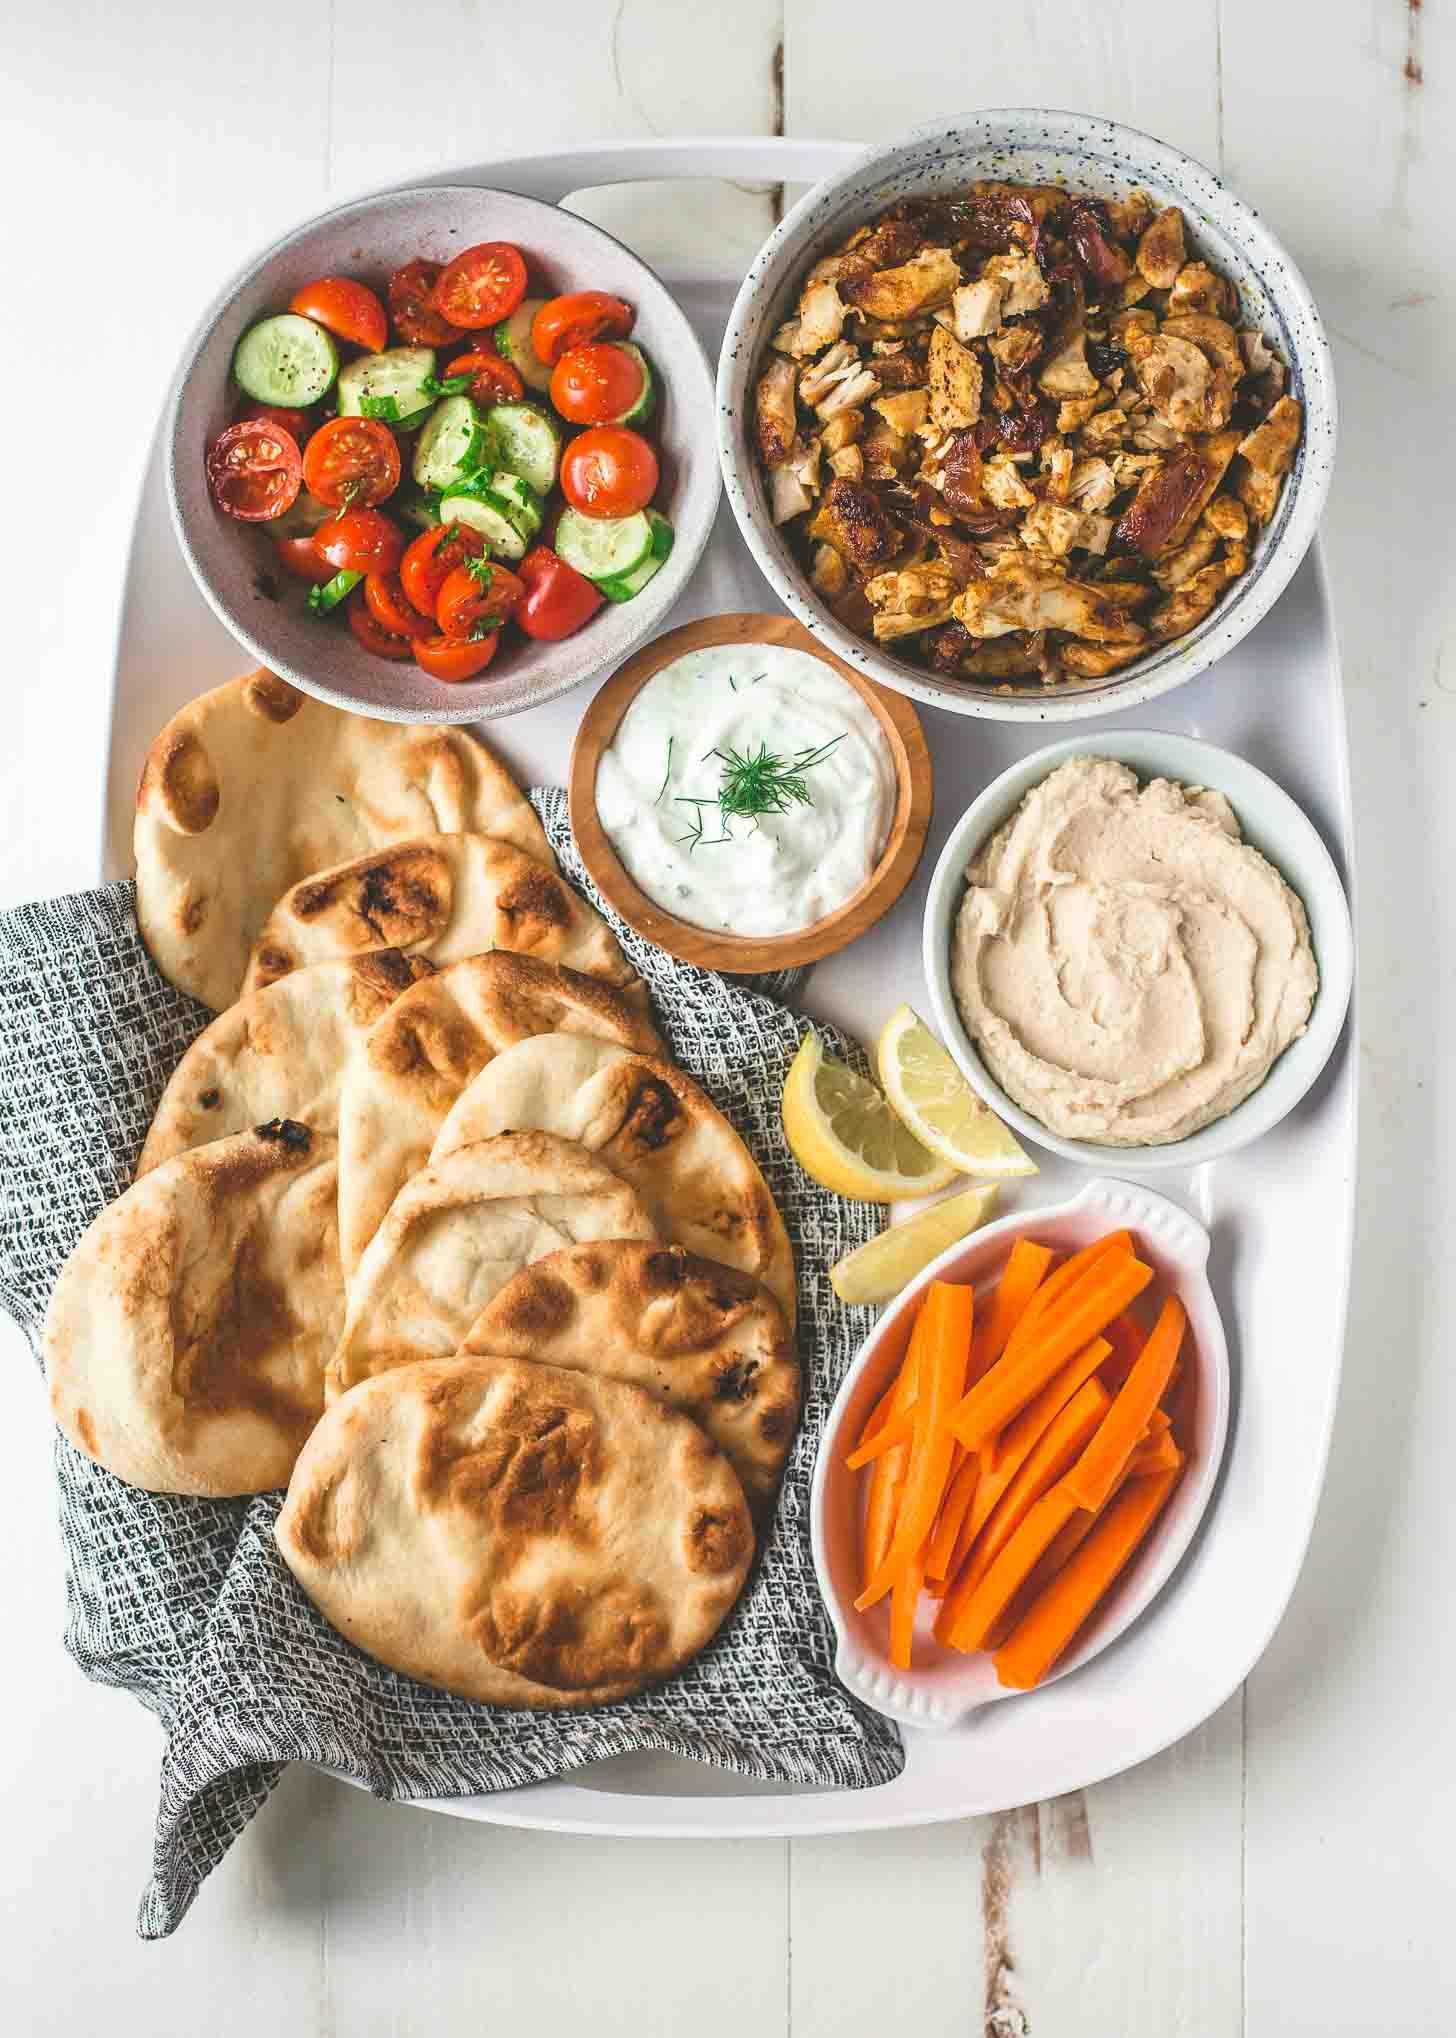 Weekly meal plan: DIY Chicken Shawarma Wraps at Inquiring Chef